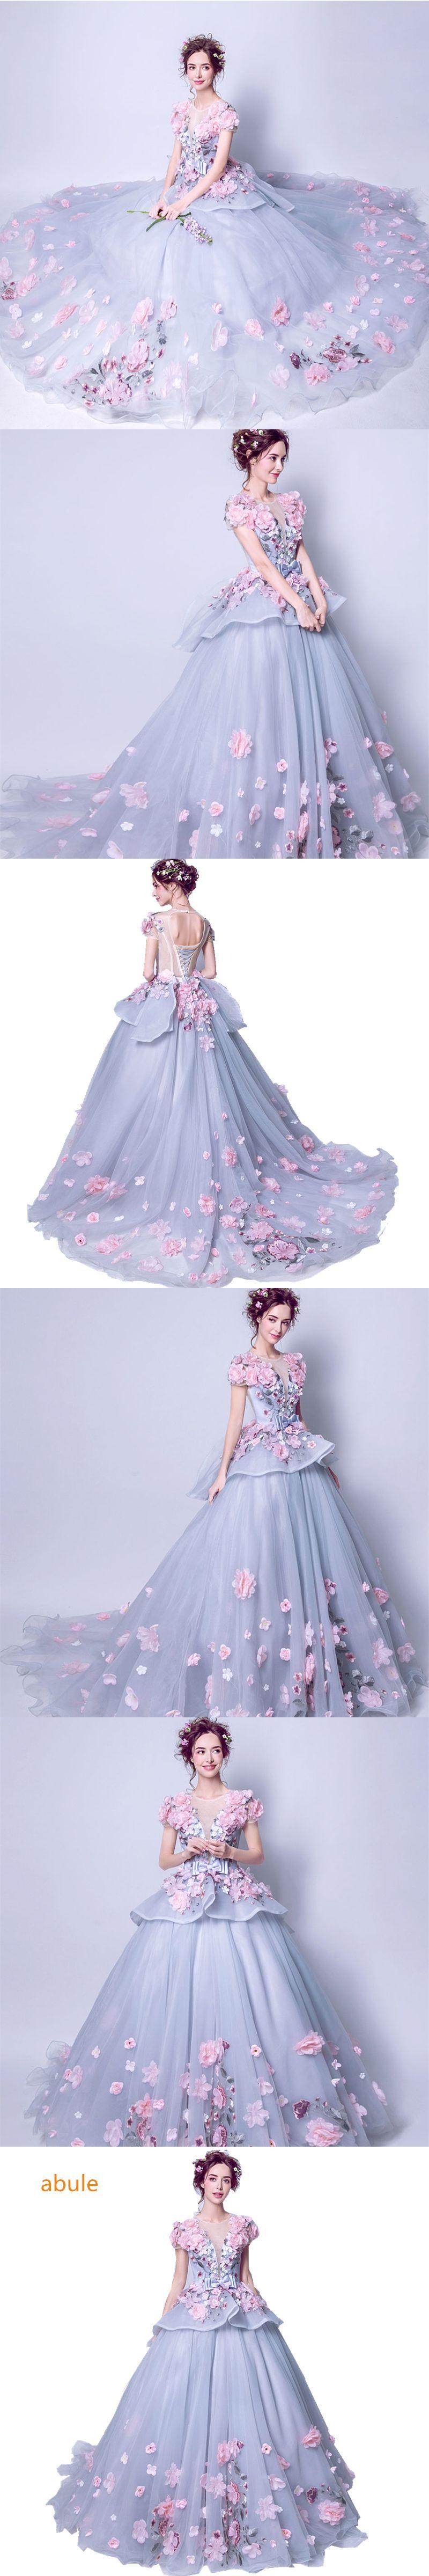 Abule vneck wedding dress sheer turkey luxury princess dubai